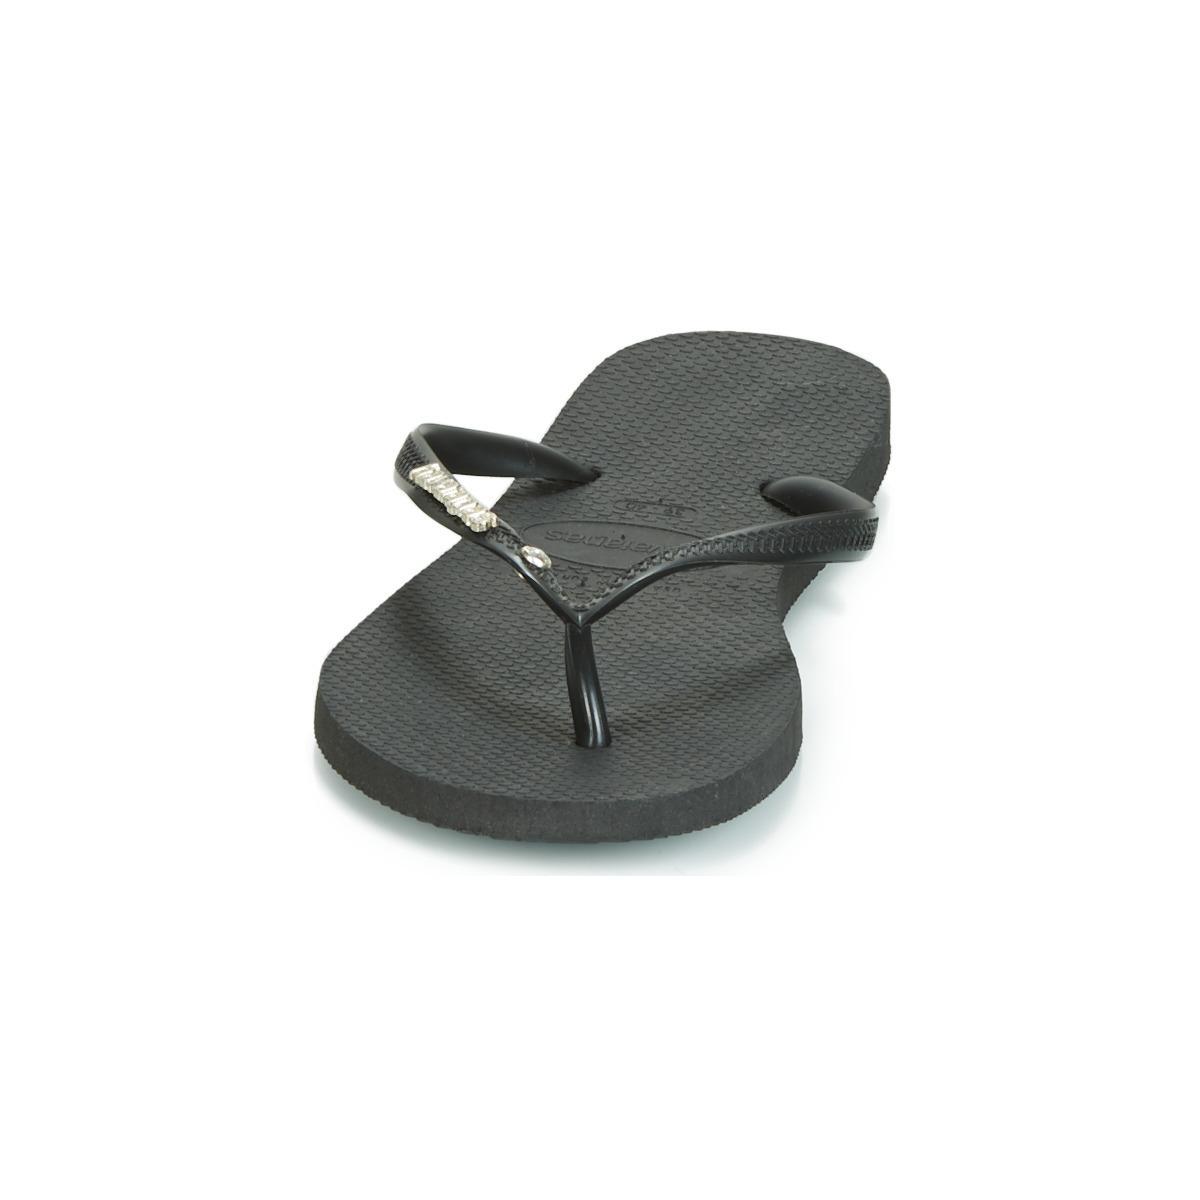 878883da5cdaea Havaianas - Multicolor Slim Logo Metallic Crystal Women s Flip Flops    Sandals (shoes) In. View fullscreen